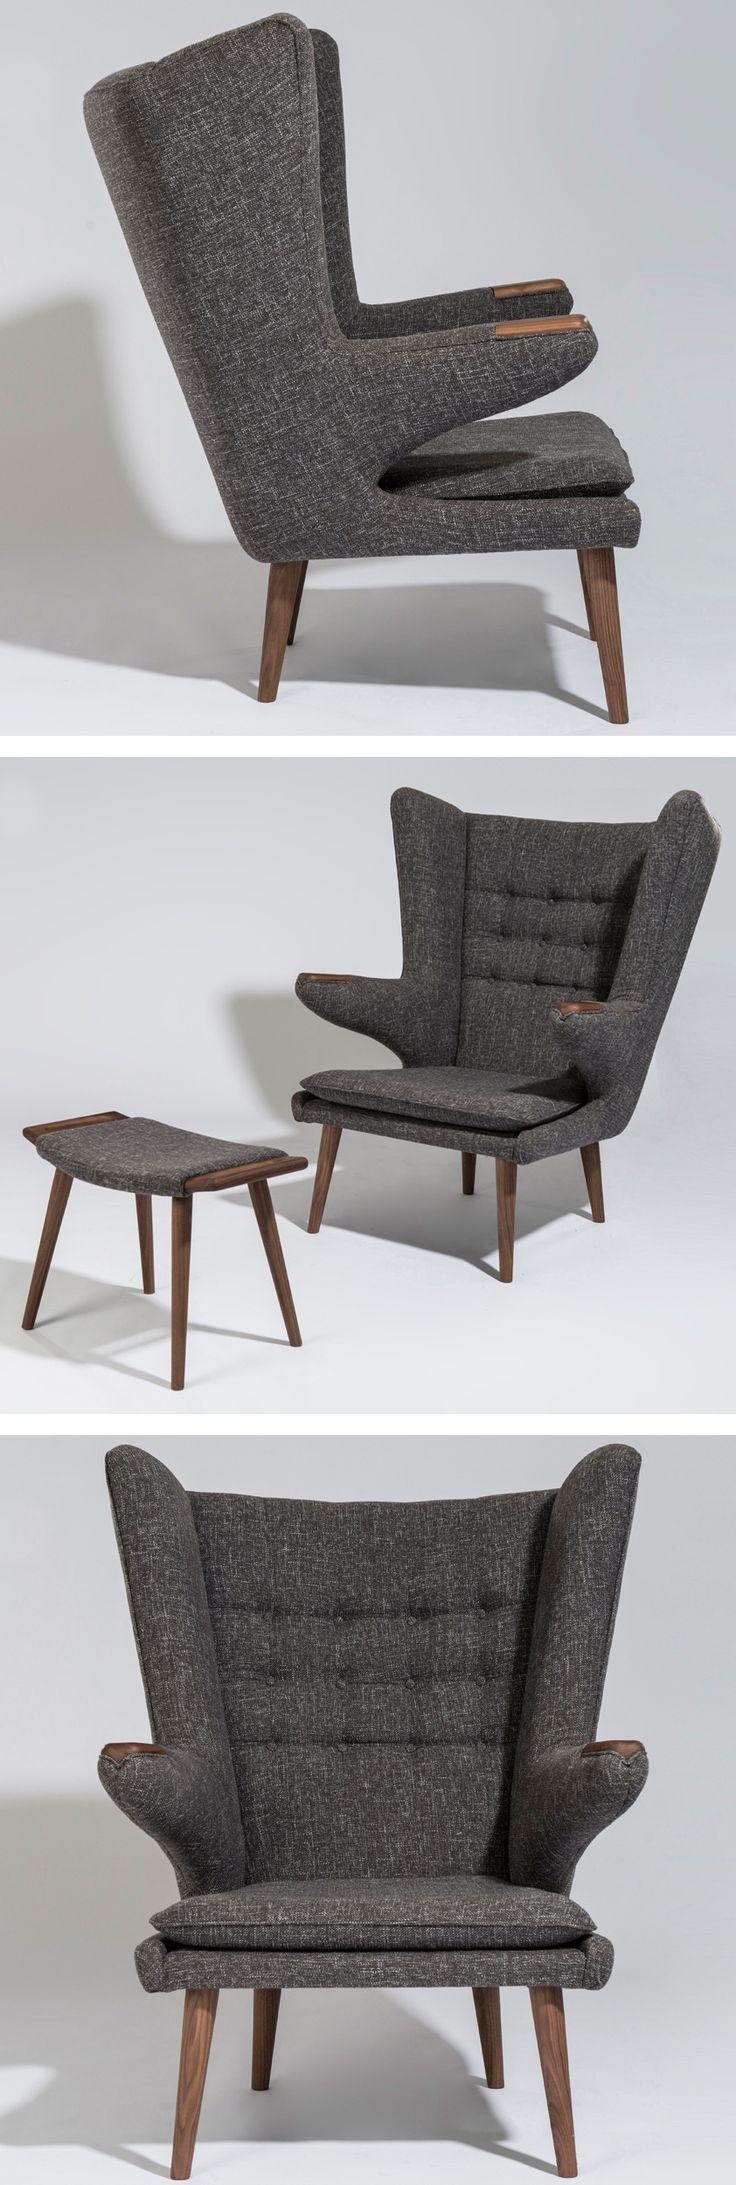 Mist comfortable chair in the world: Hans Wegner Style Papa Bear Chair